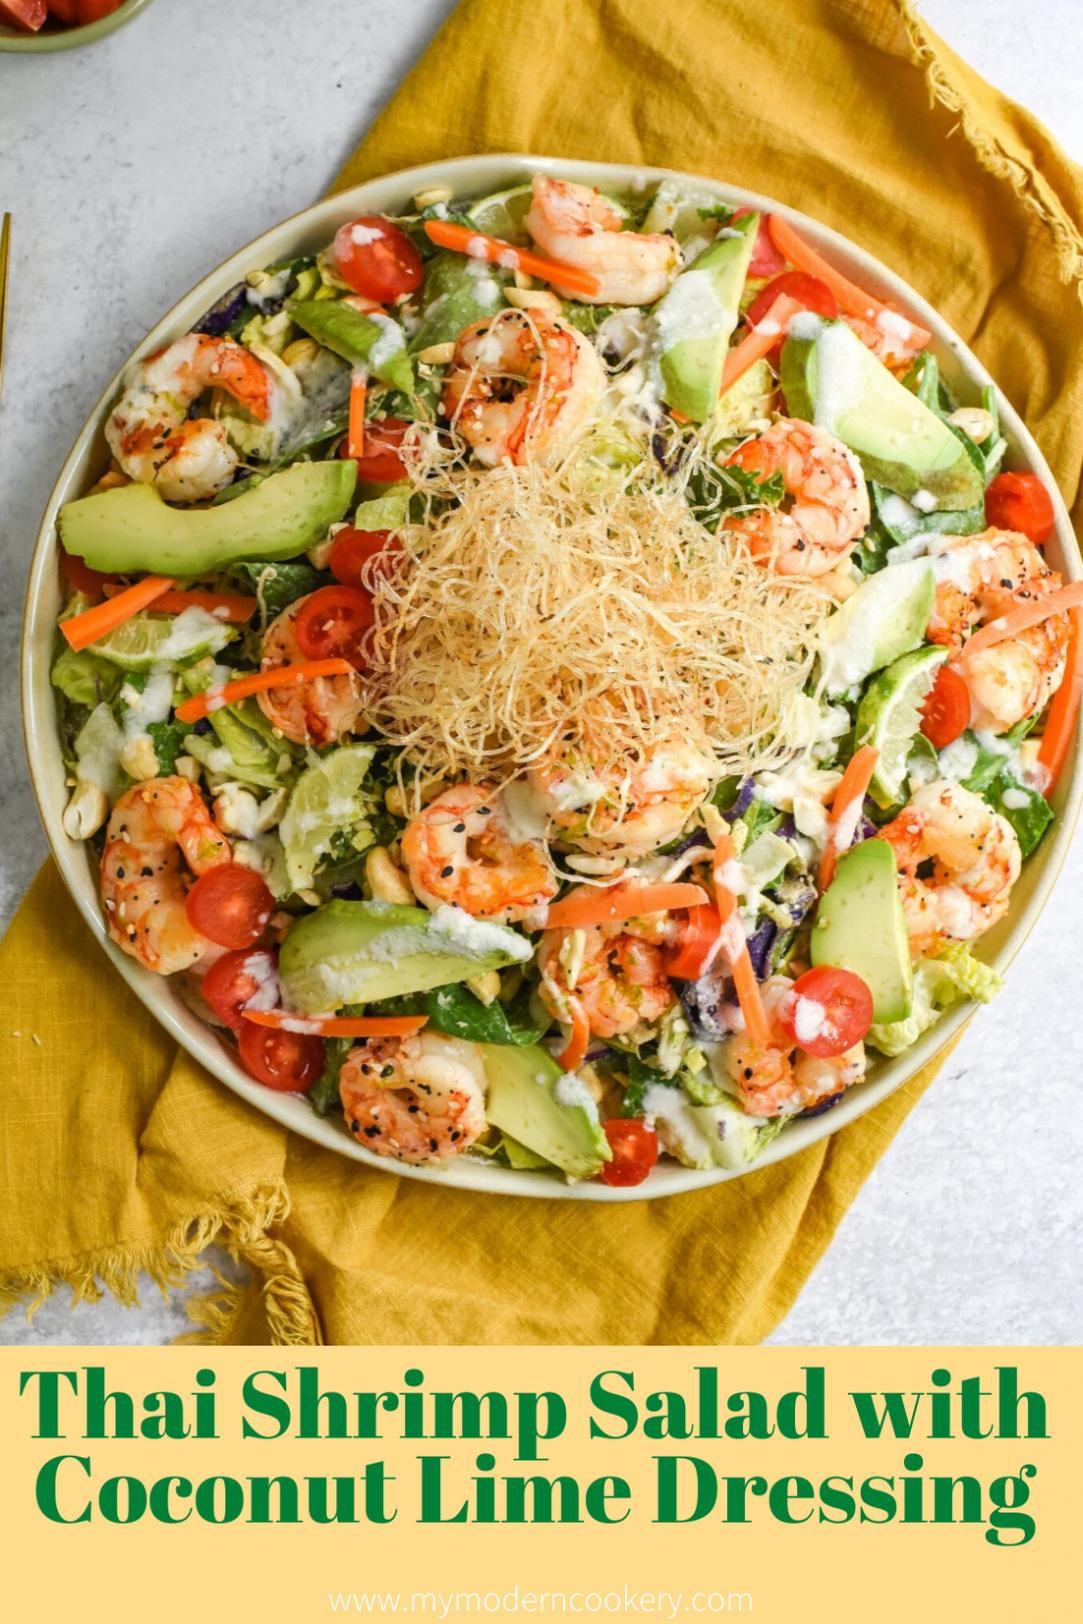 Thai Shrimp Salad with Coconut Lime Dressing